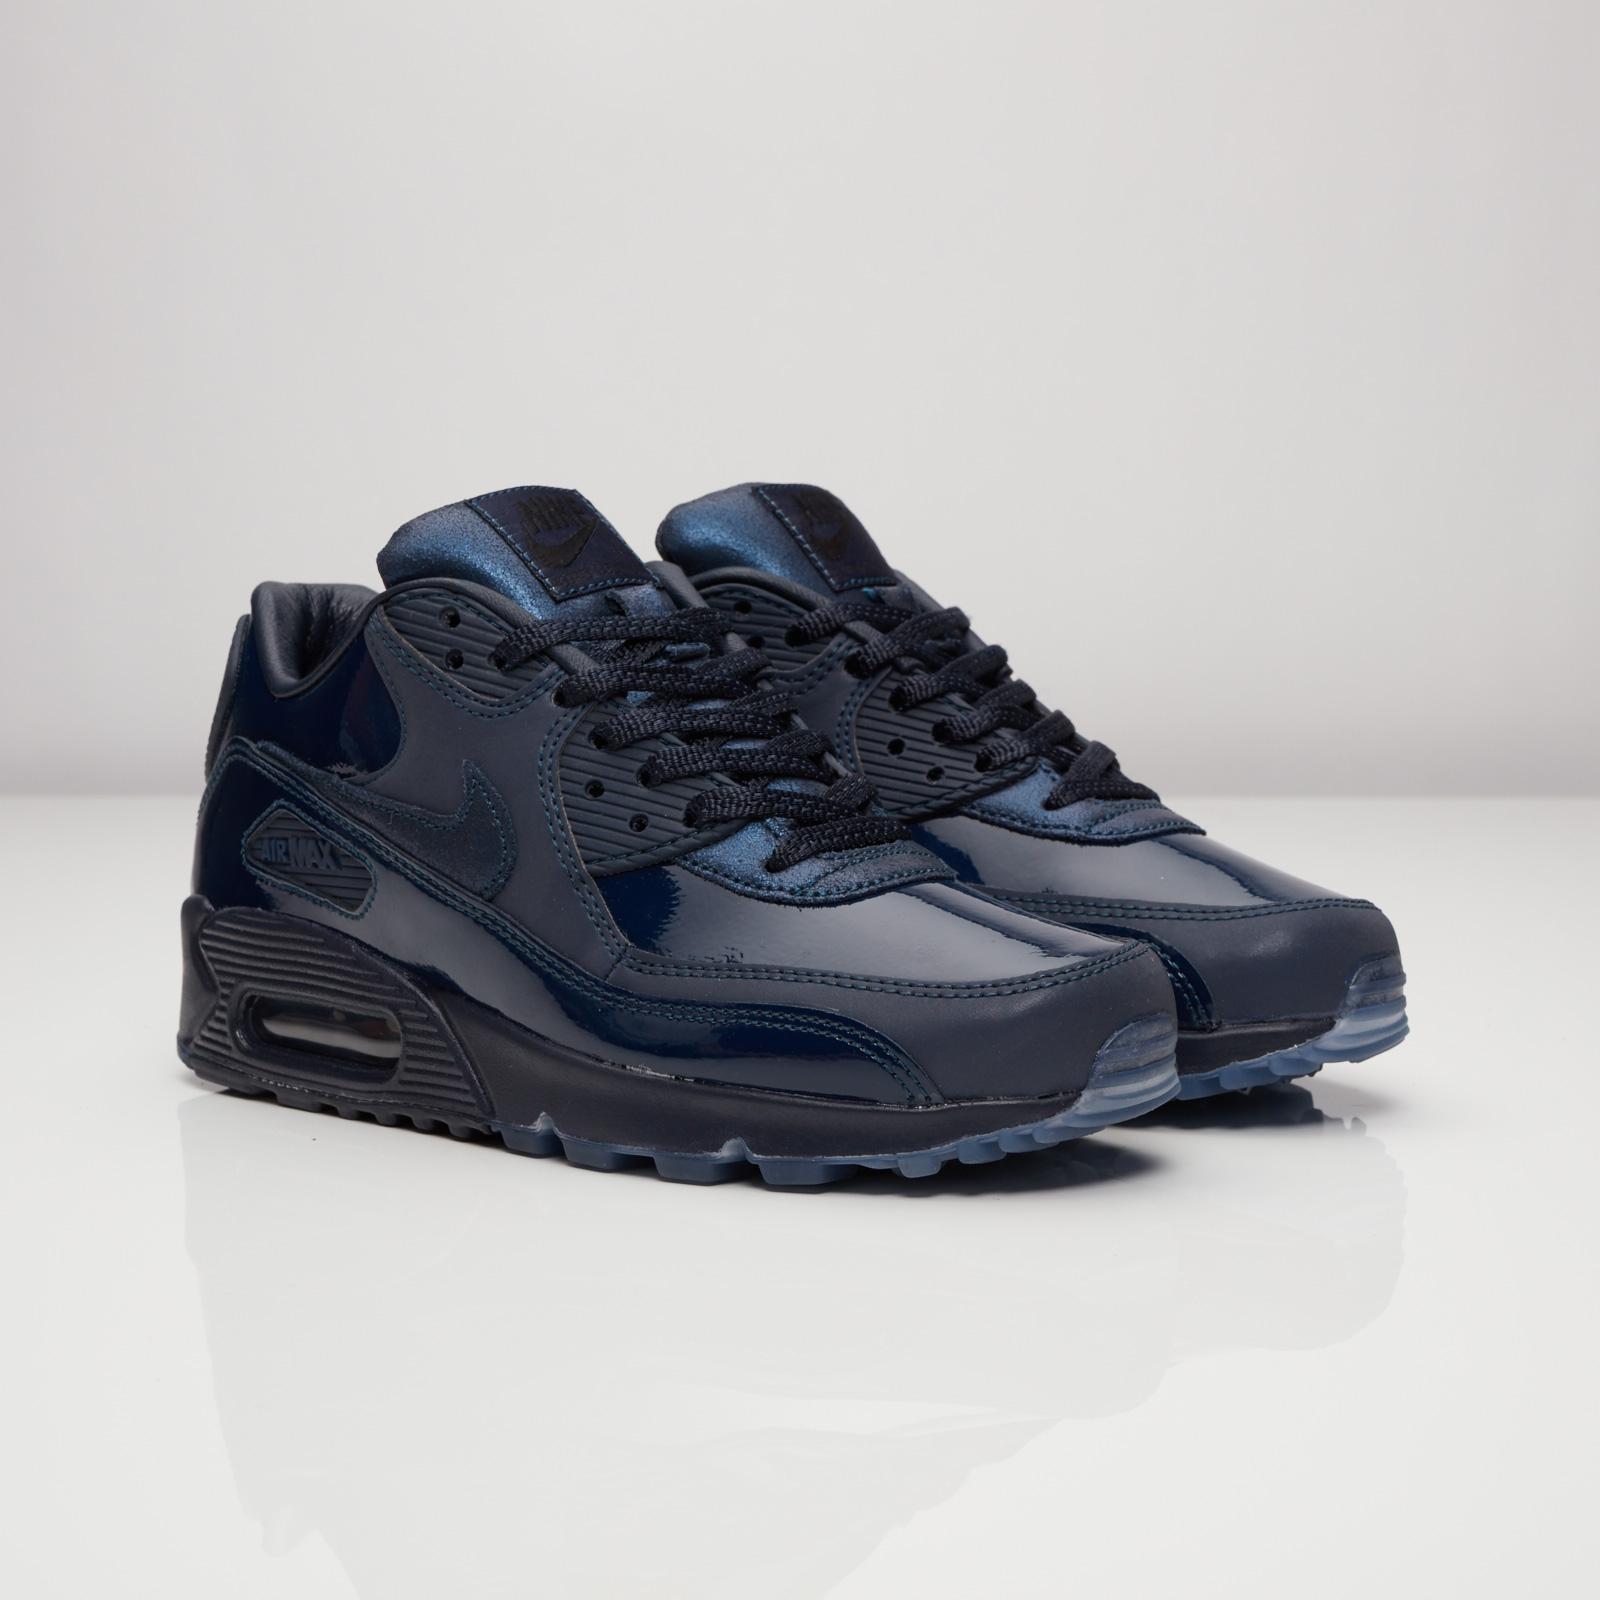 db0d5b669057fe Nike Wmns Air Max 90 Pedro Lourenco - 867116-400 - Sneakersnstuff ...